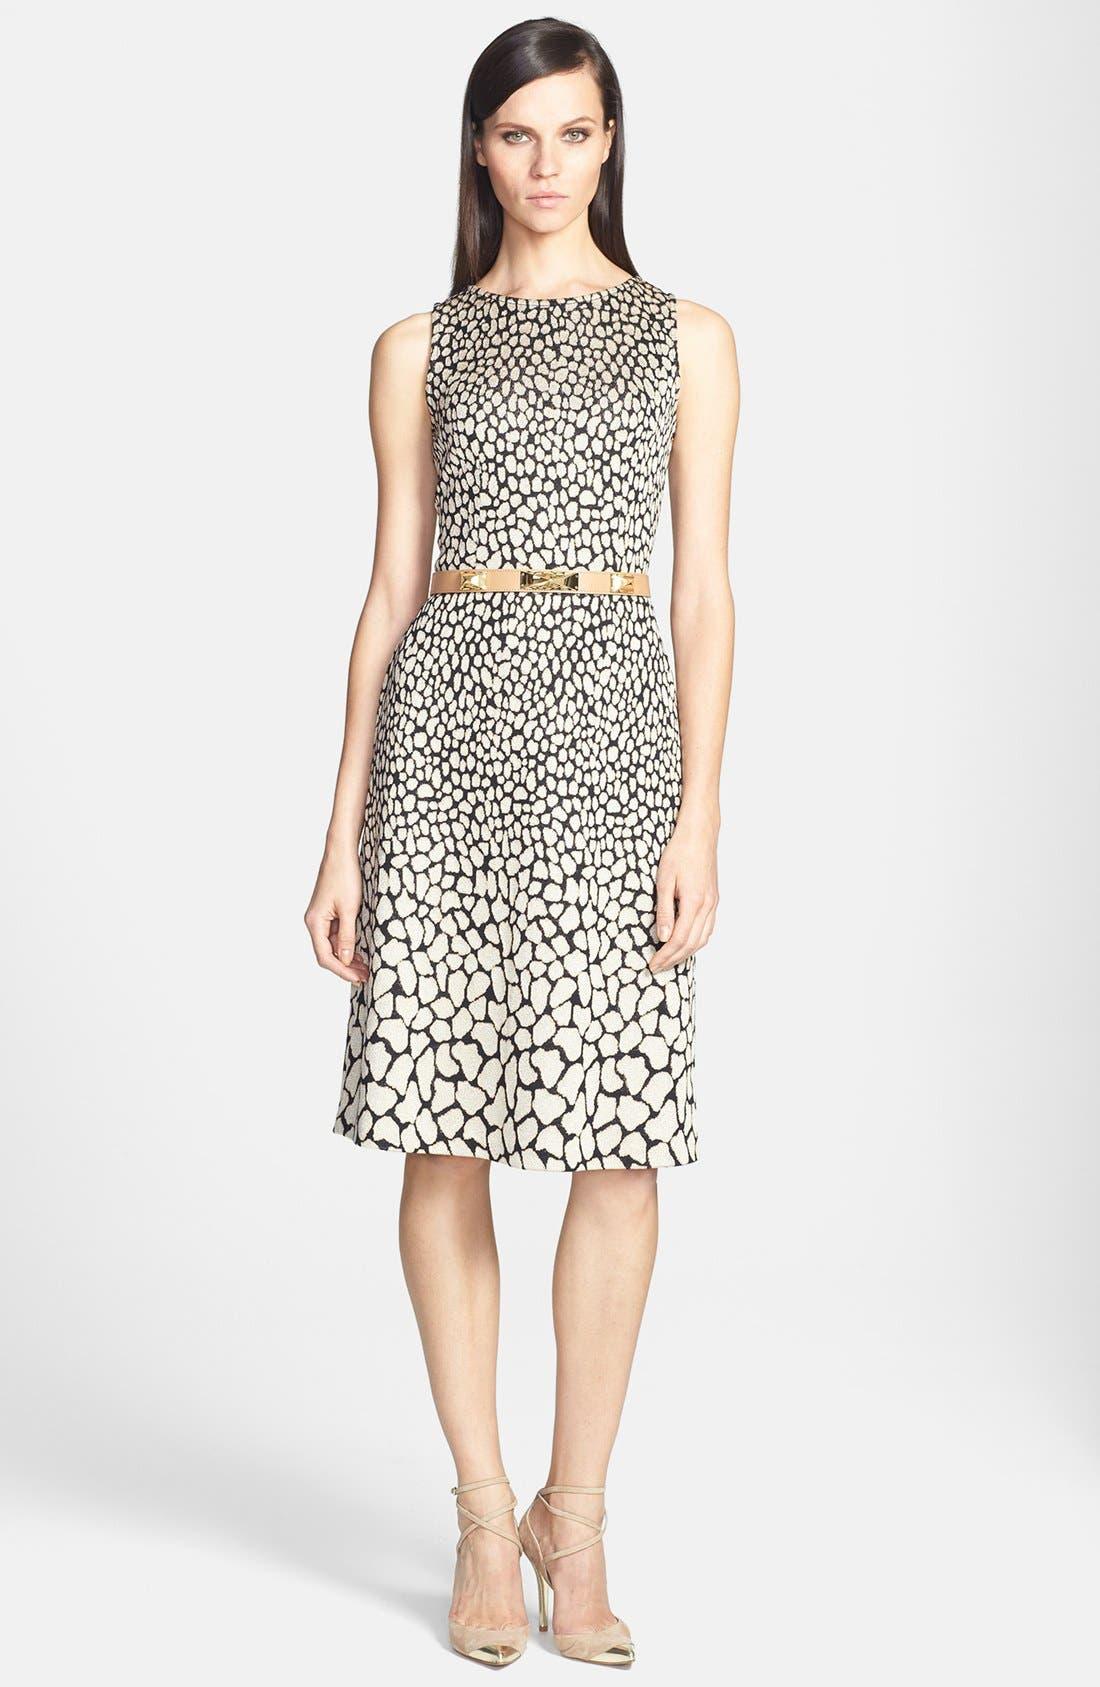 Main Image - St. John Collection Animal Jacquard Knit Dress